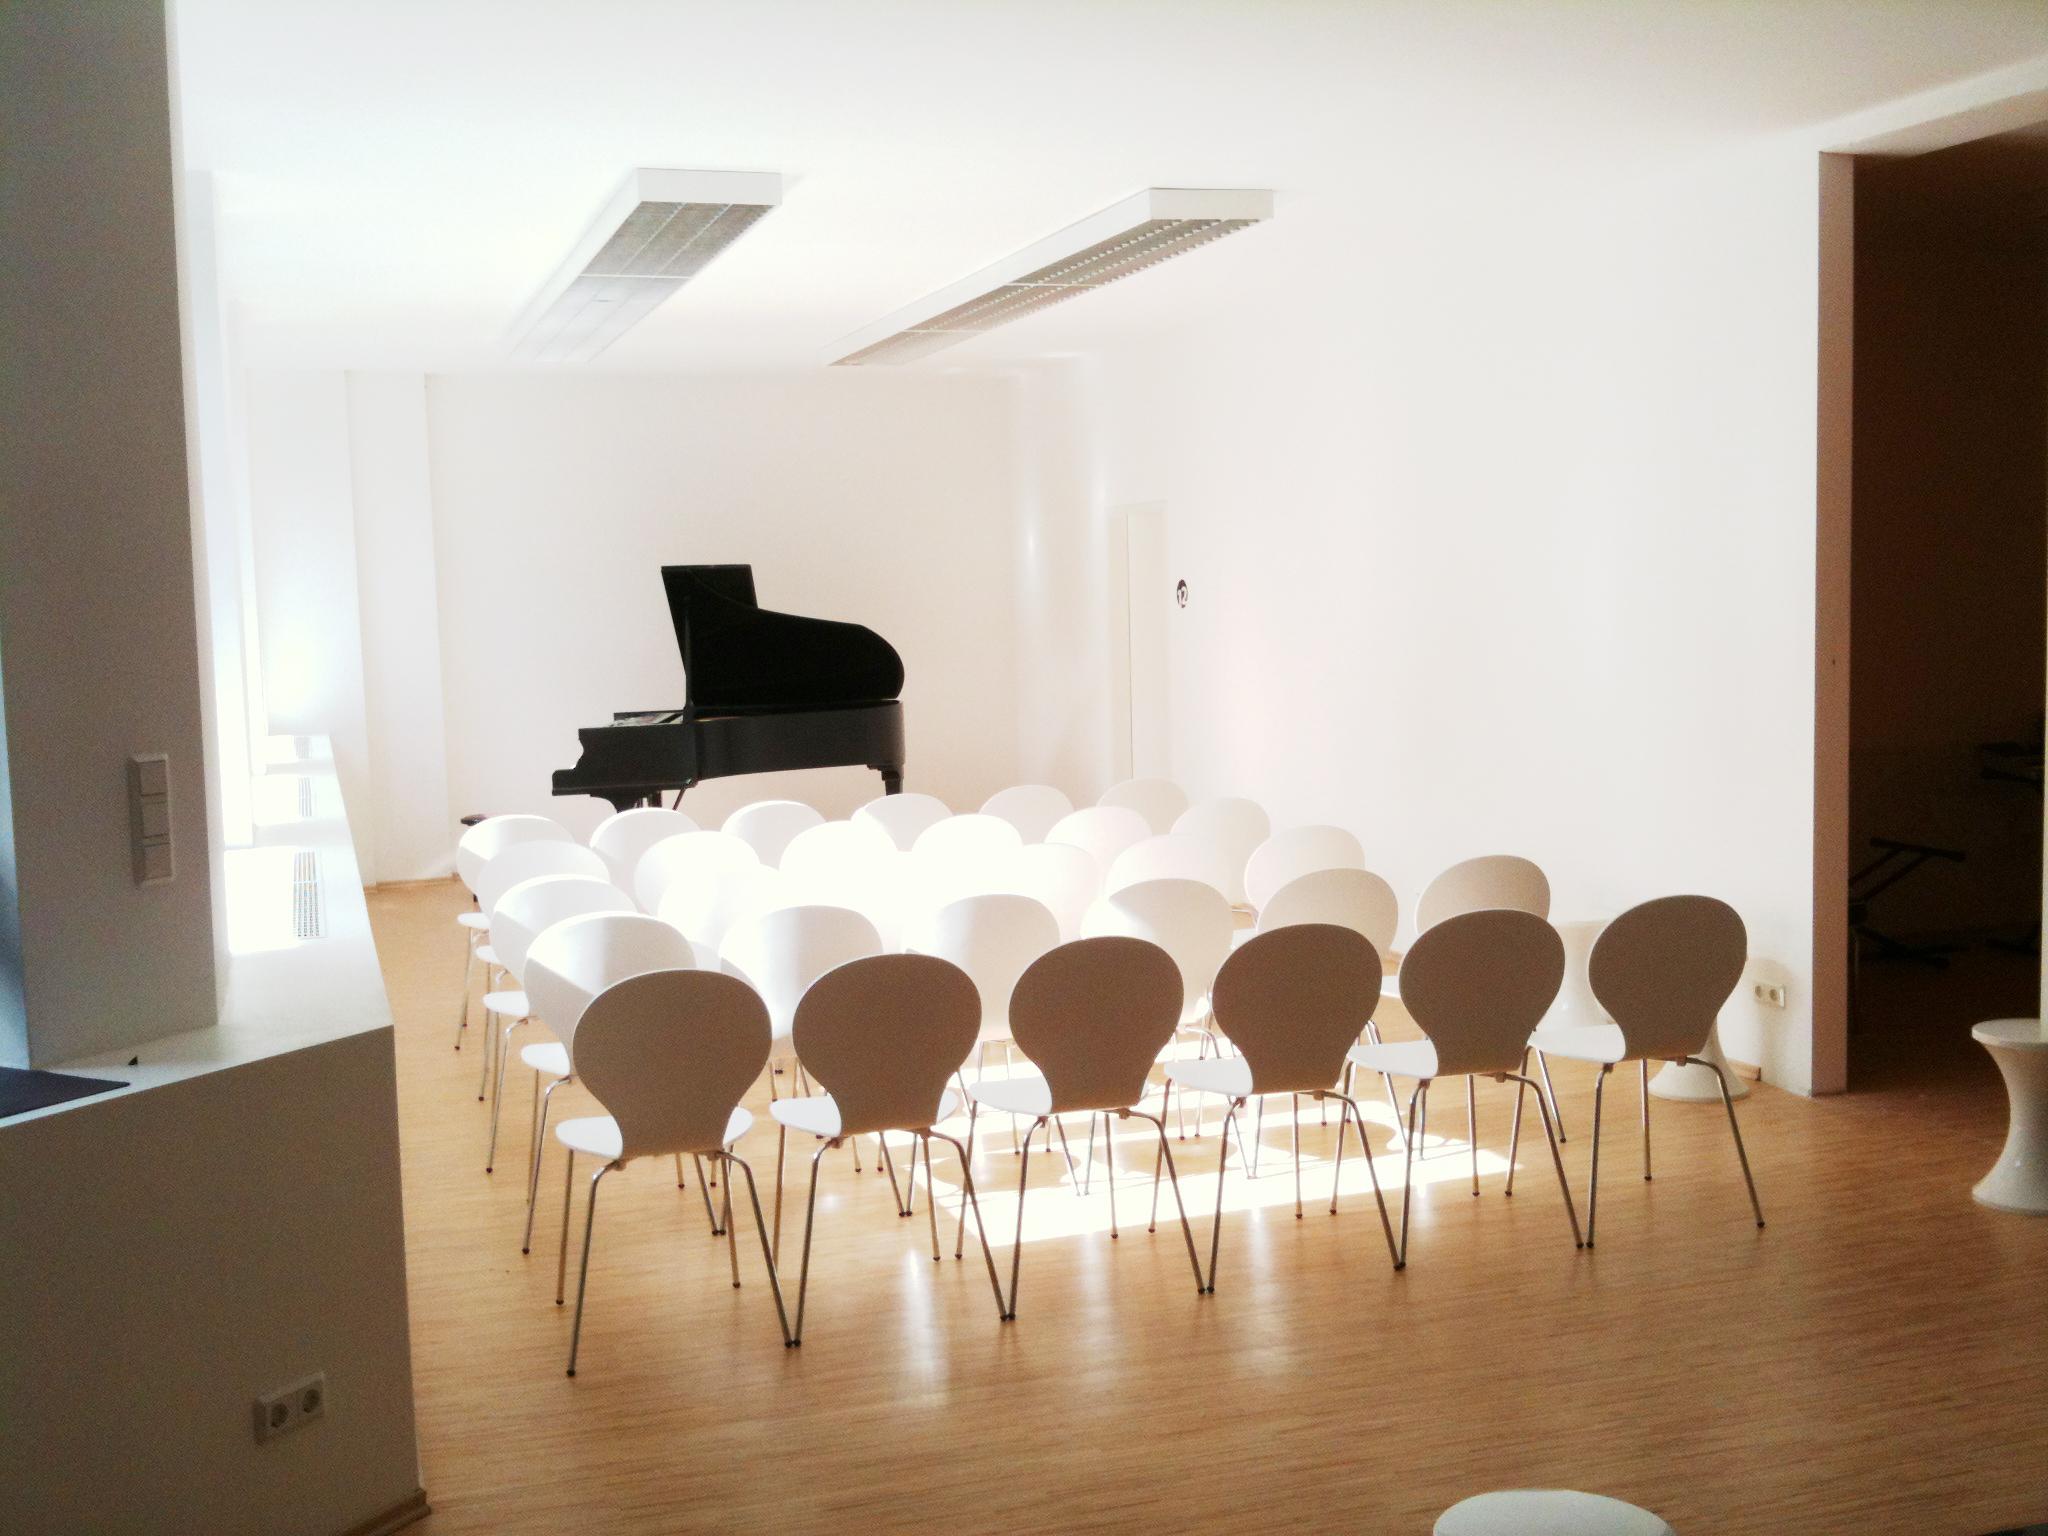 Musikschule Mannheim TonARTE,R4, 5-7